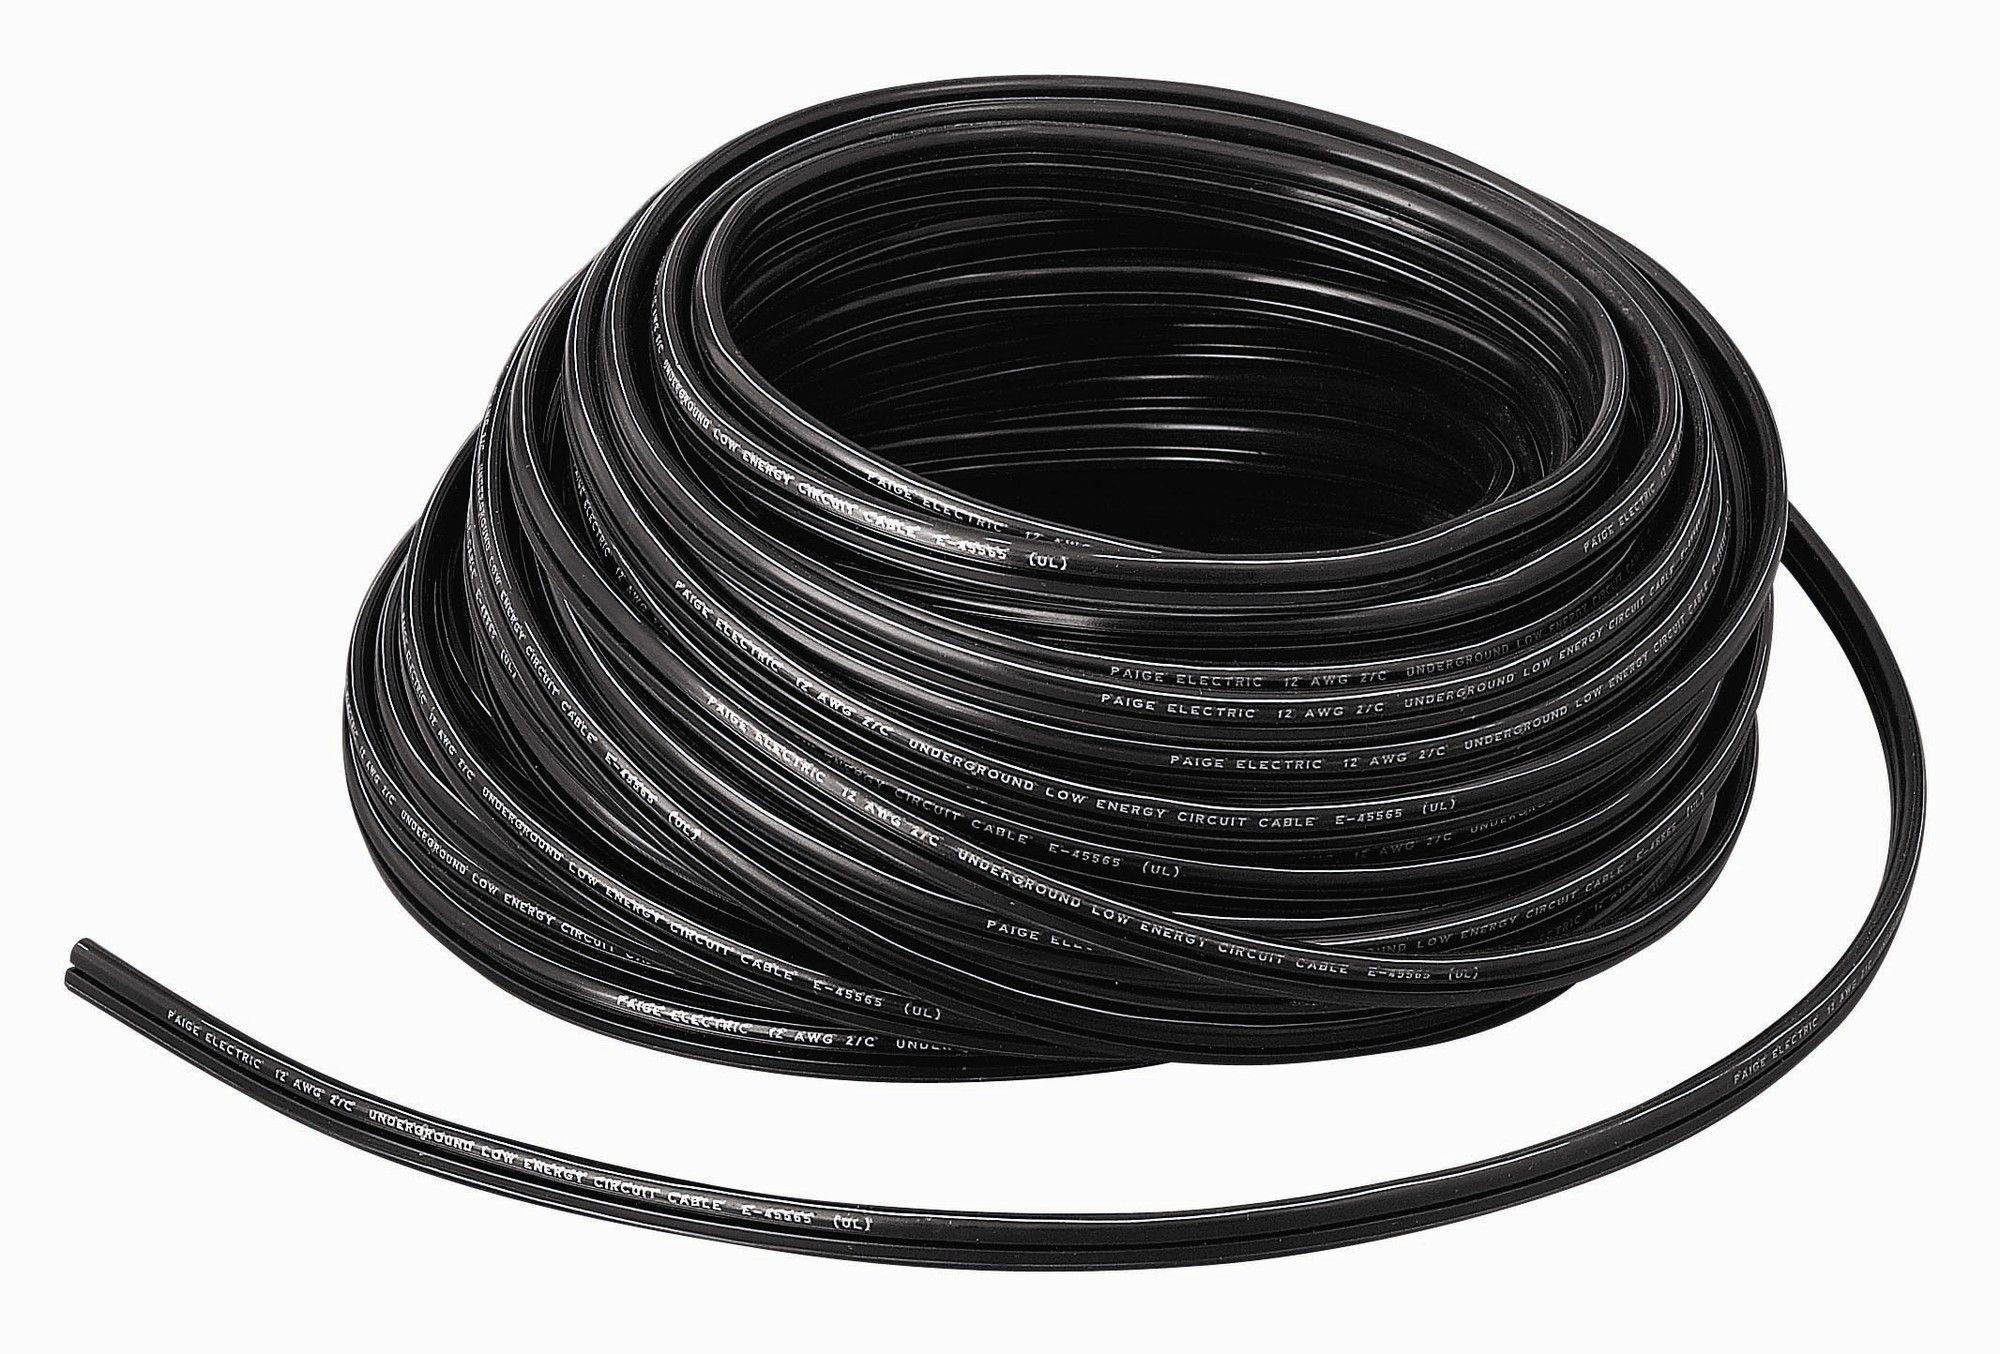 wire 12 gauge 100 feet wire spool electrical supplies outdoor lighting landscape lighting [ 2000 x 1354 Pixel ]